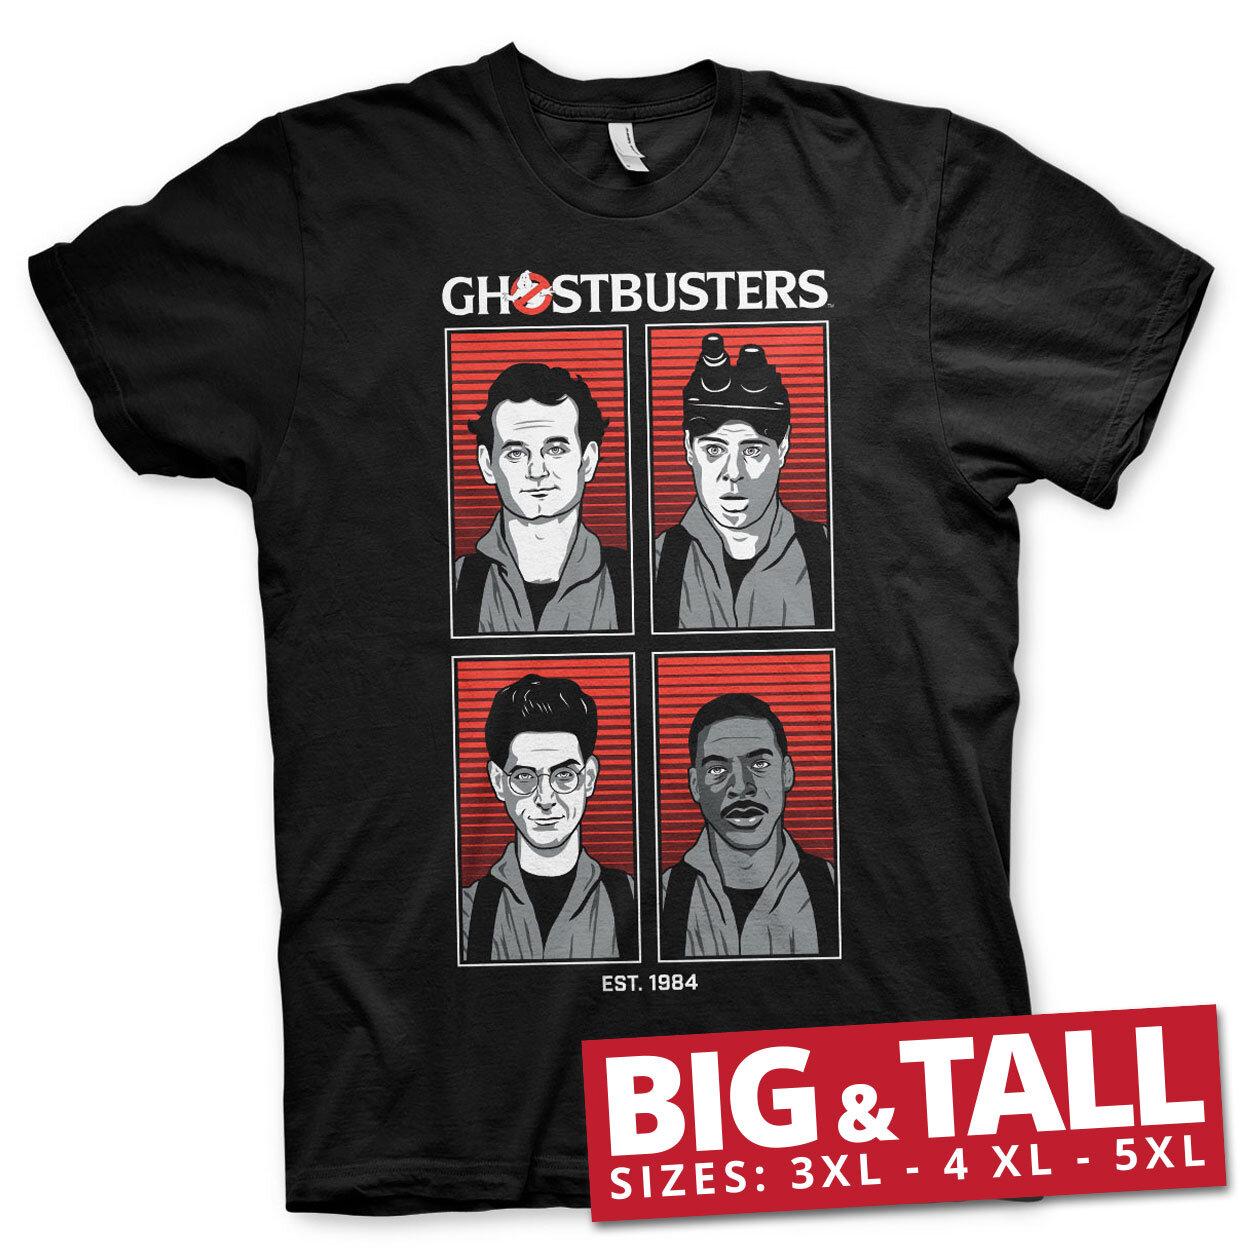 Ghostbusters Original Team Big & Tall T-Shirt